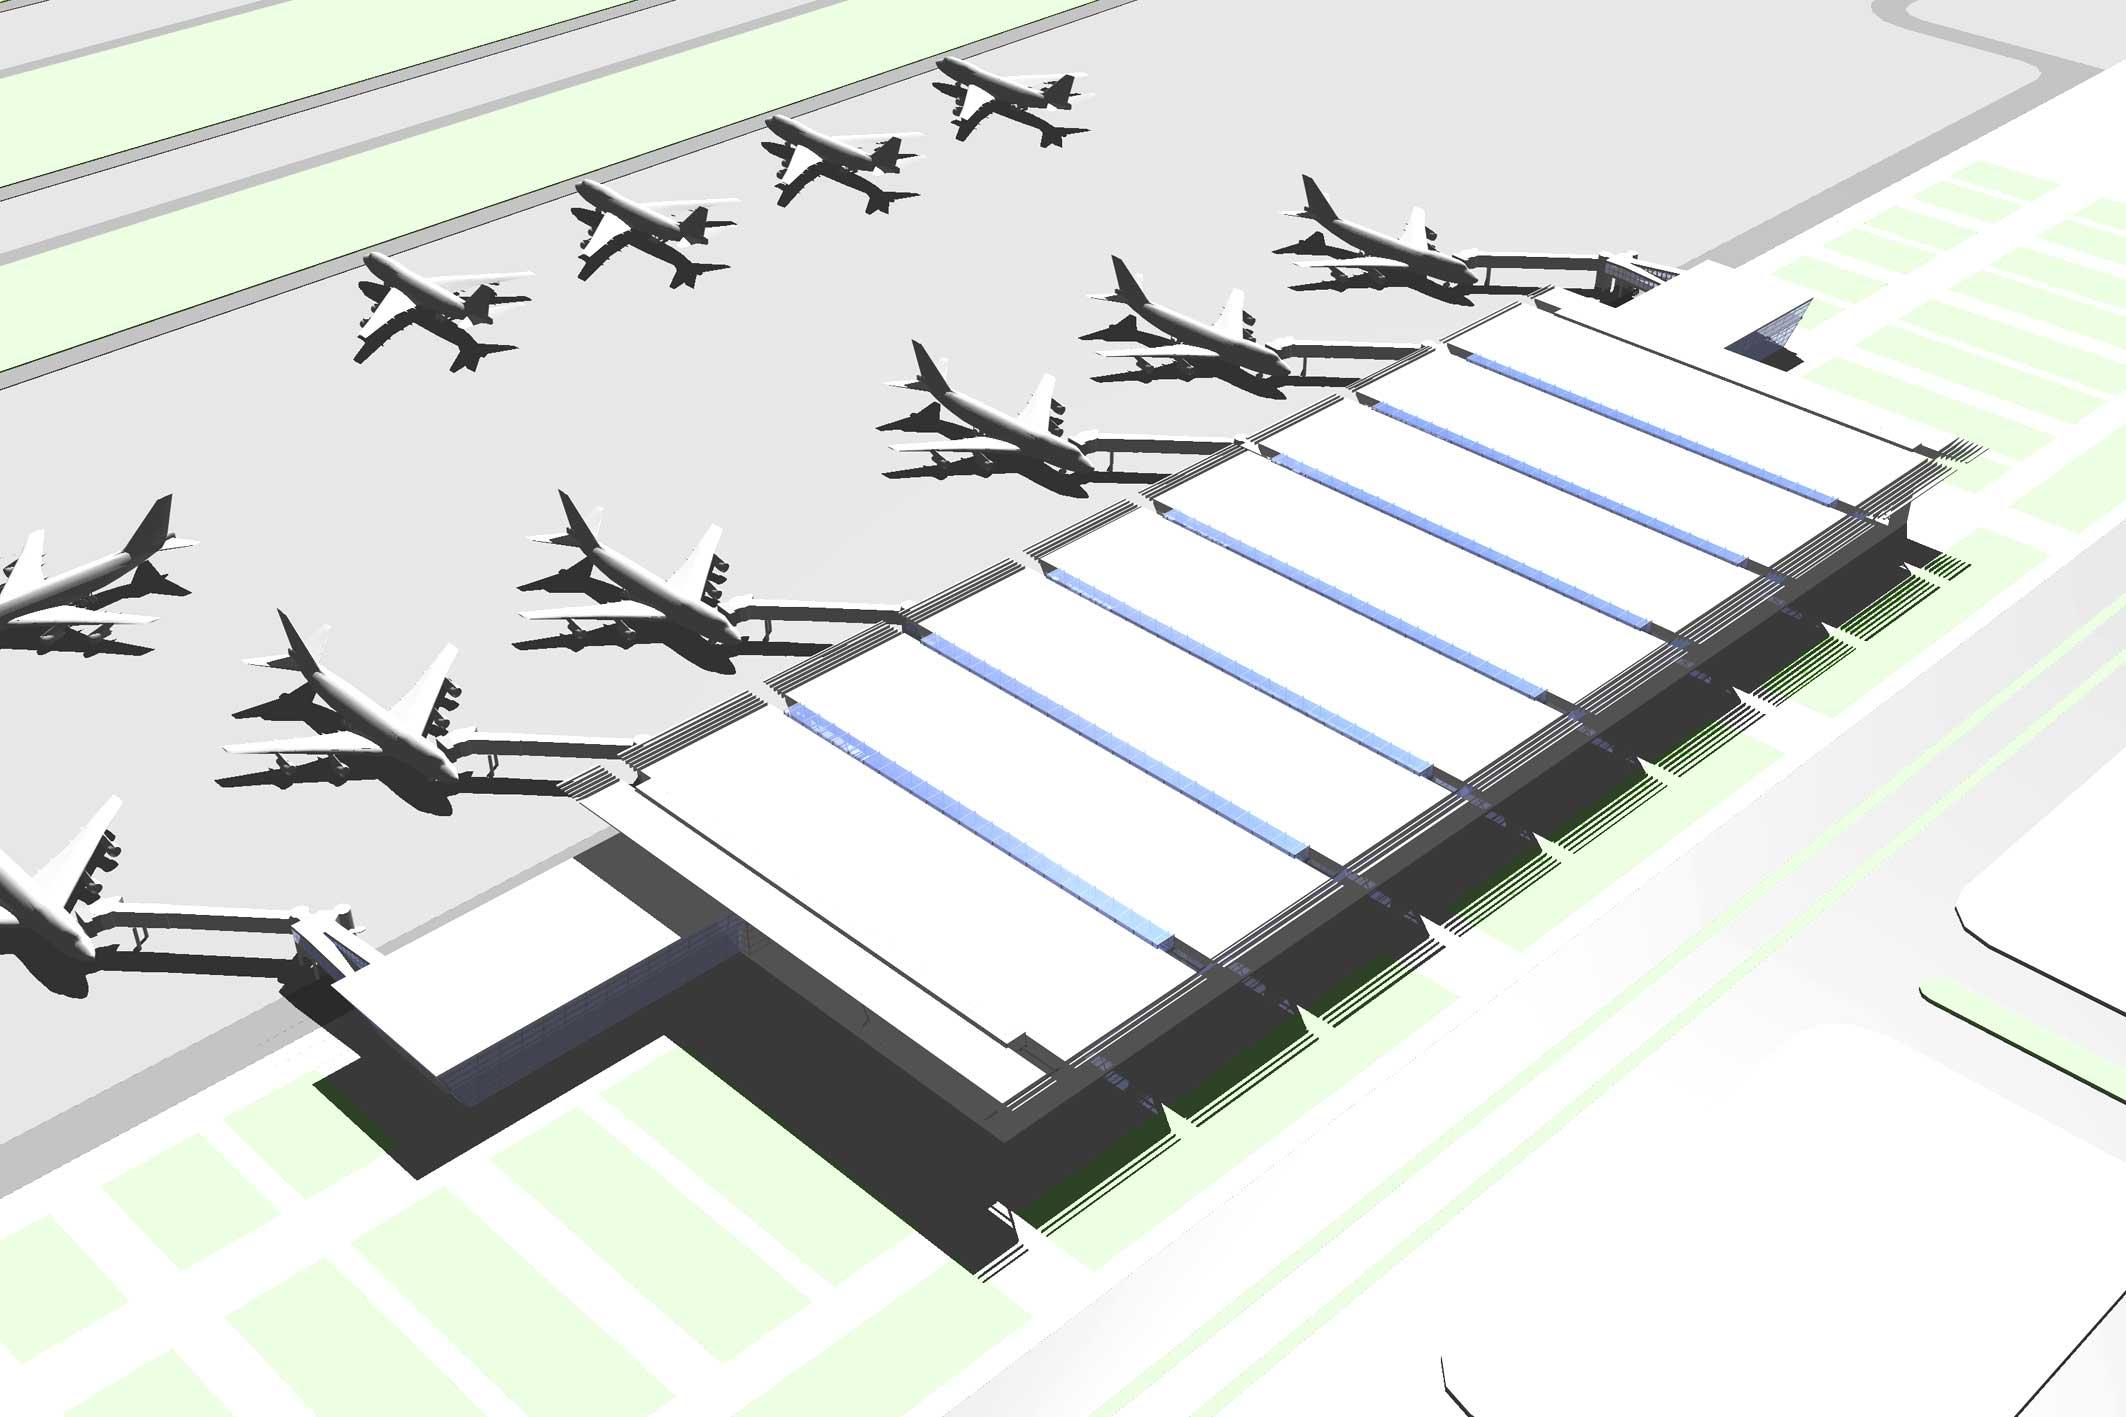 فرودگاه بین المللی کیش